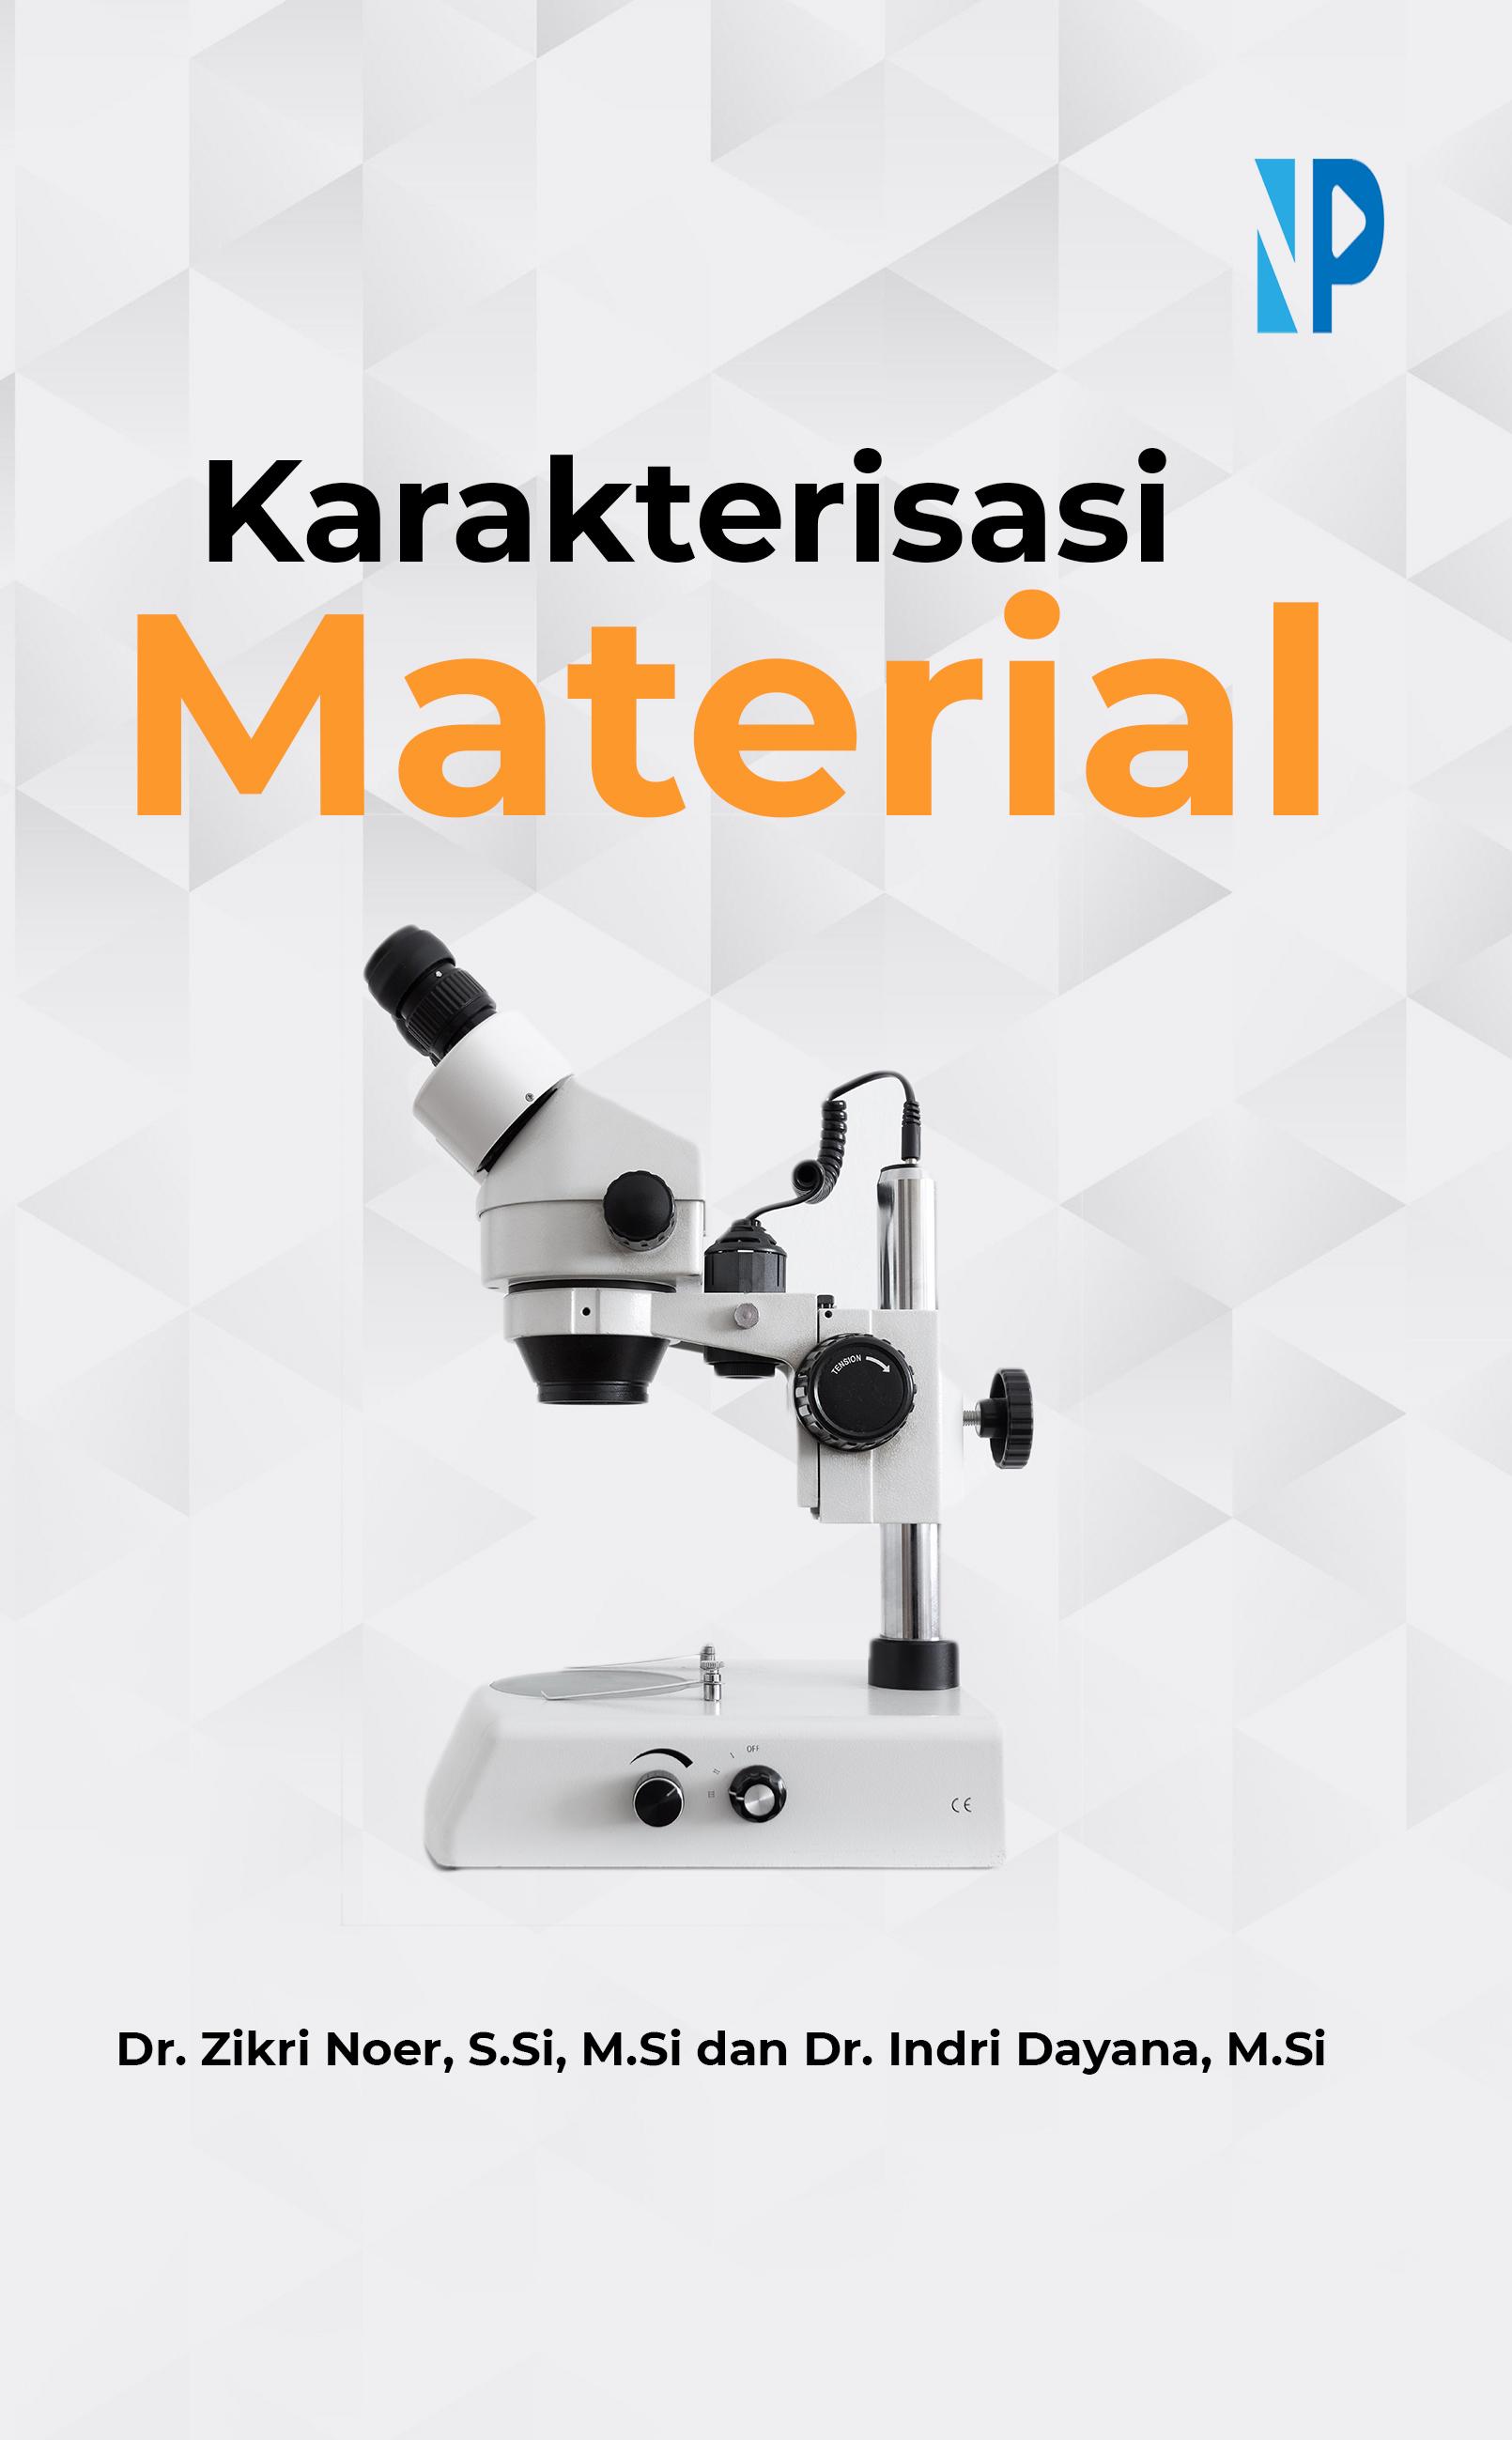 Karakterisasi material [sumber elektronis]